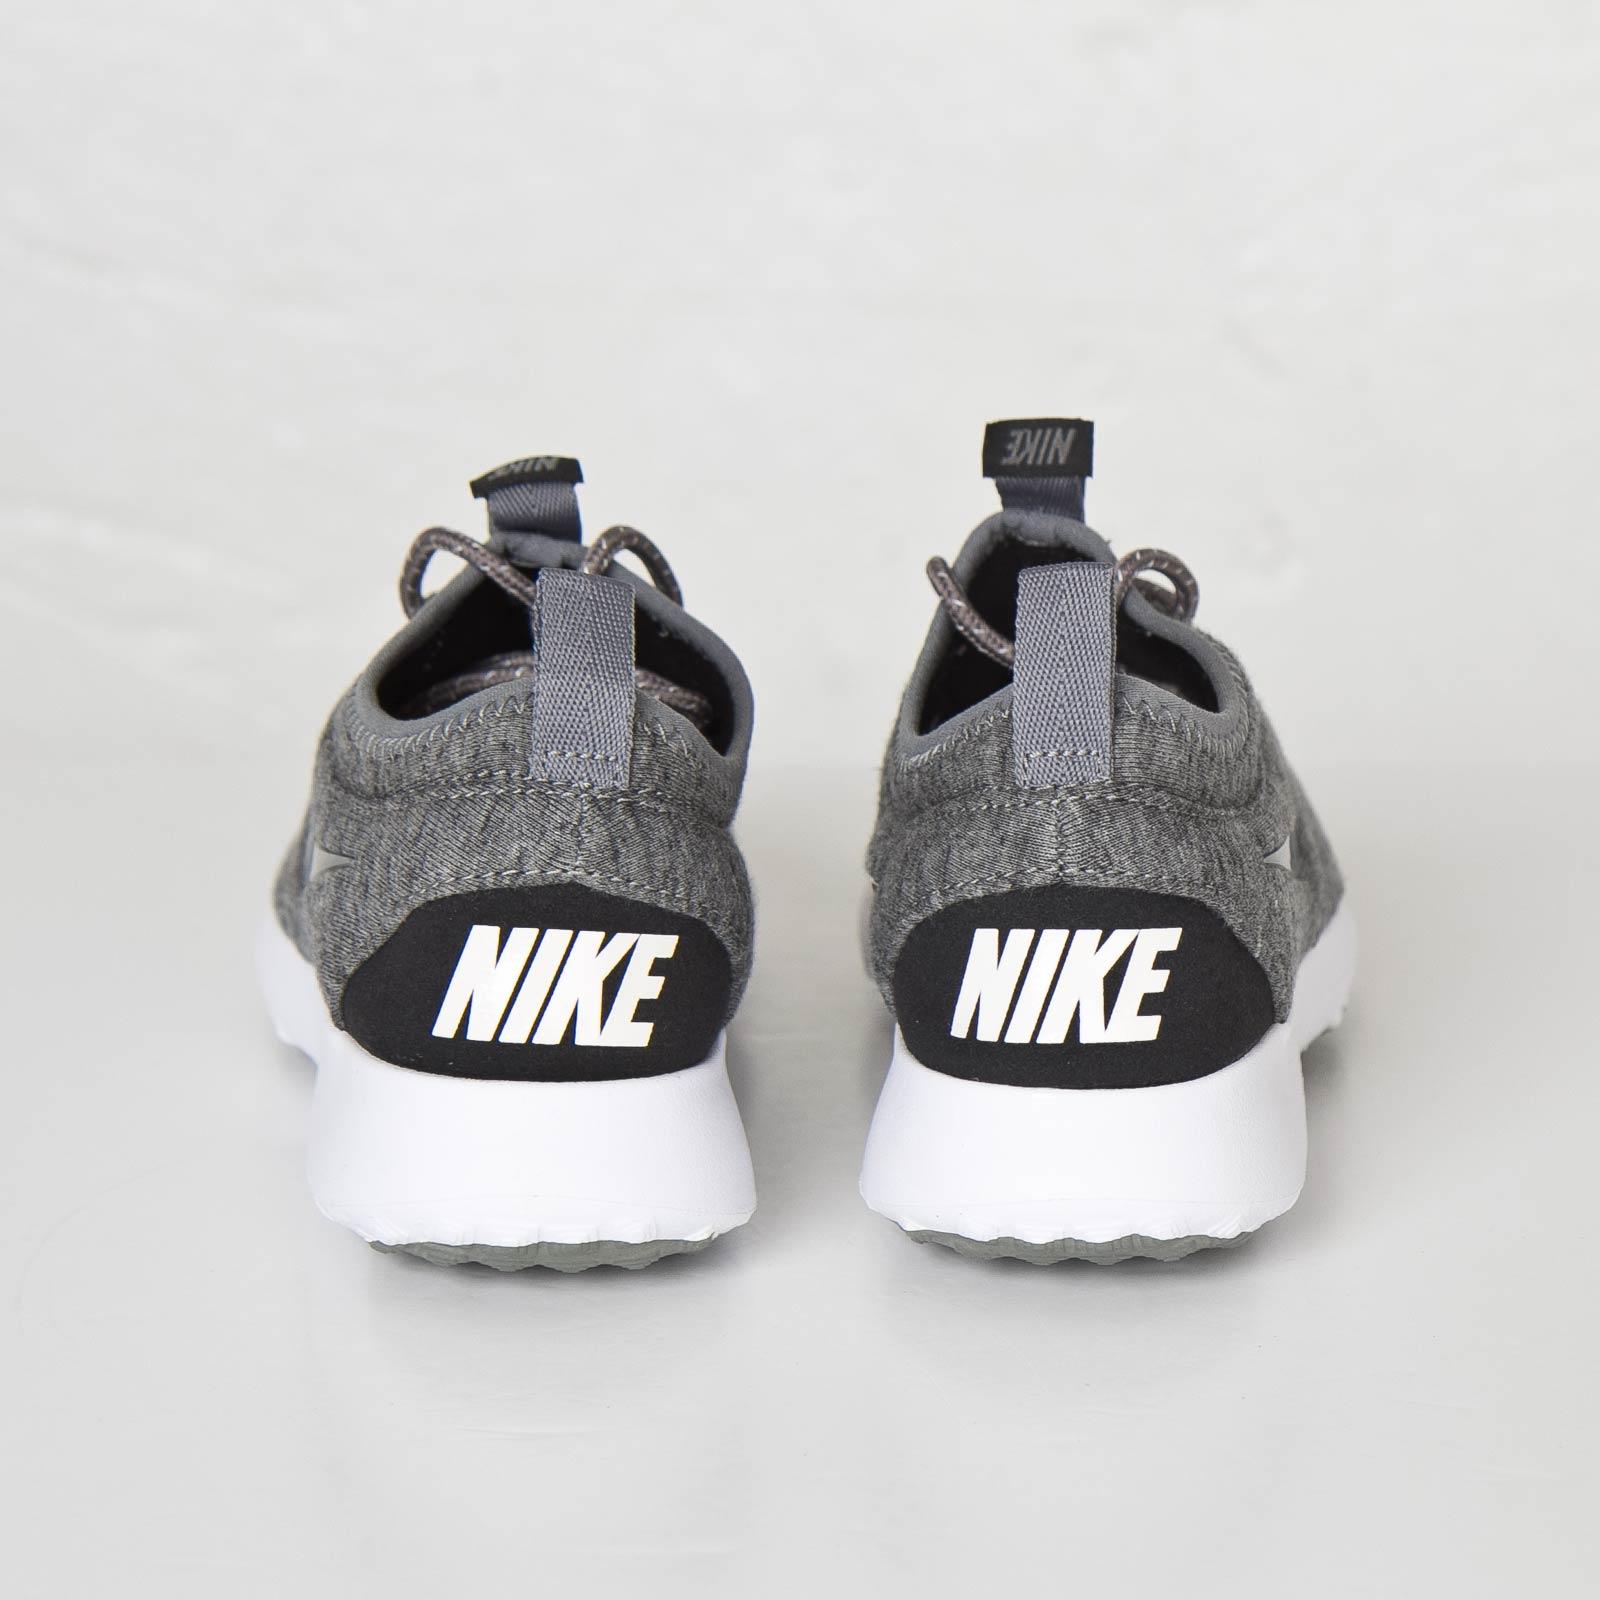 online retailer dad69 321d7 Nike Wmns Juvenate Fleece - 749551-001 - Sneakersnstuff   sneakers    streetwear online since 1999